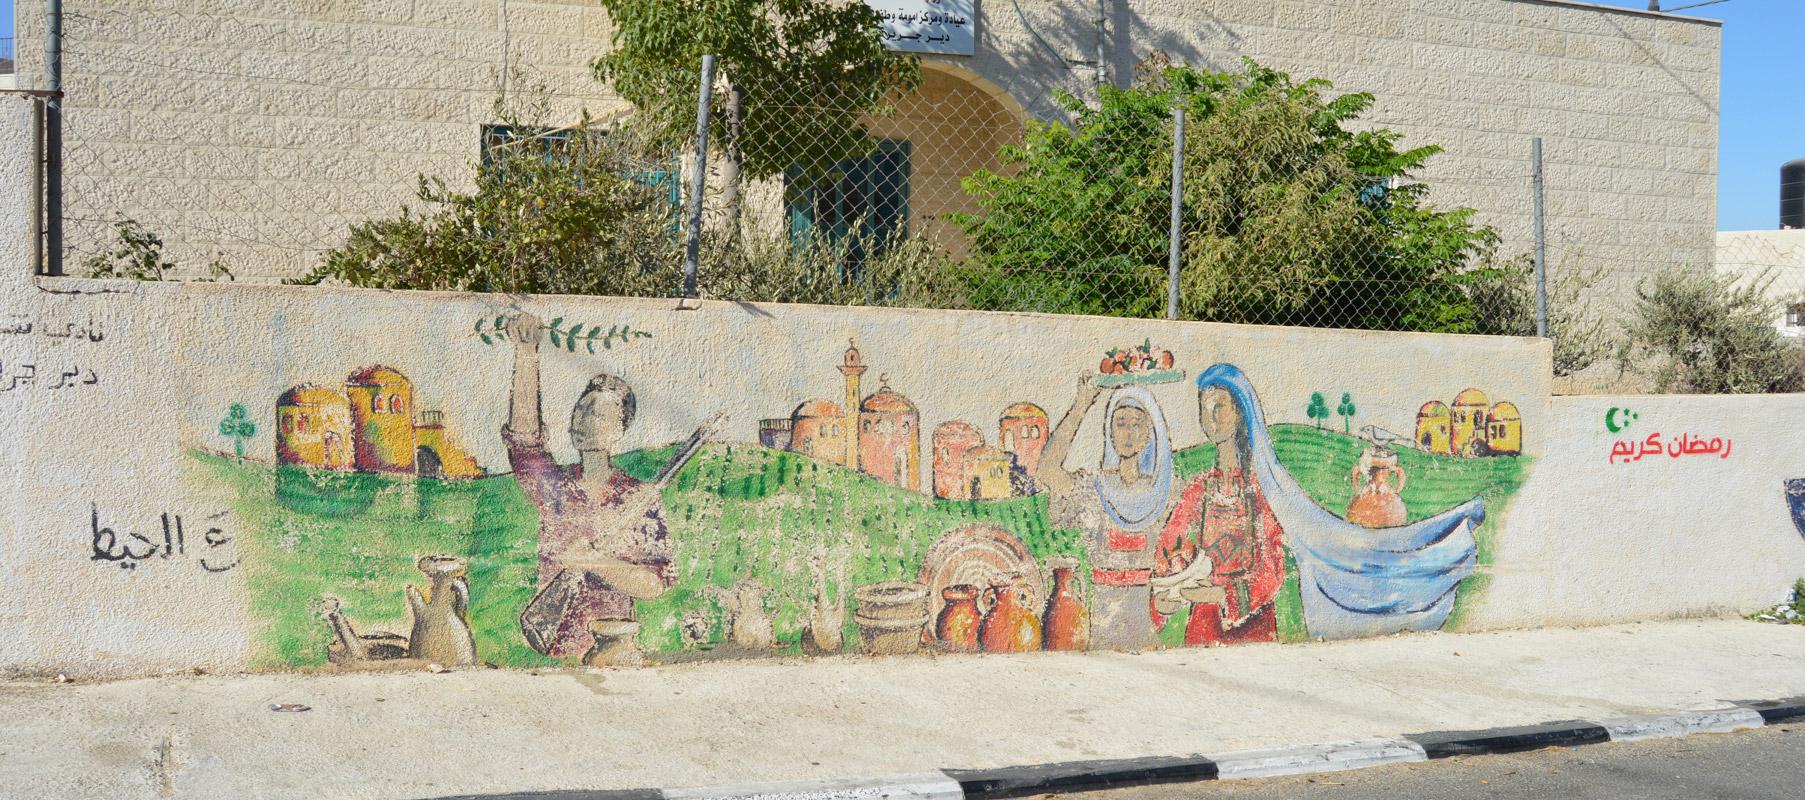 deir jarir palestine